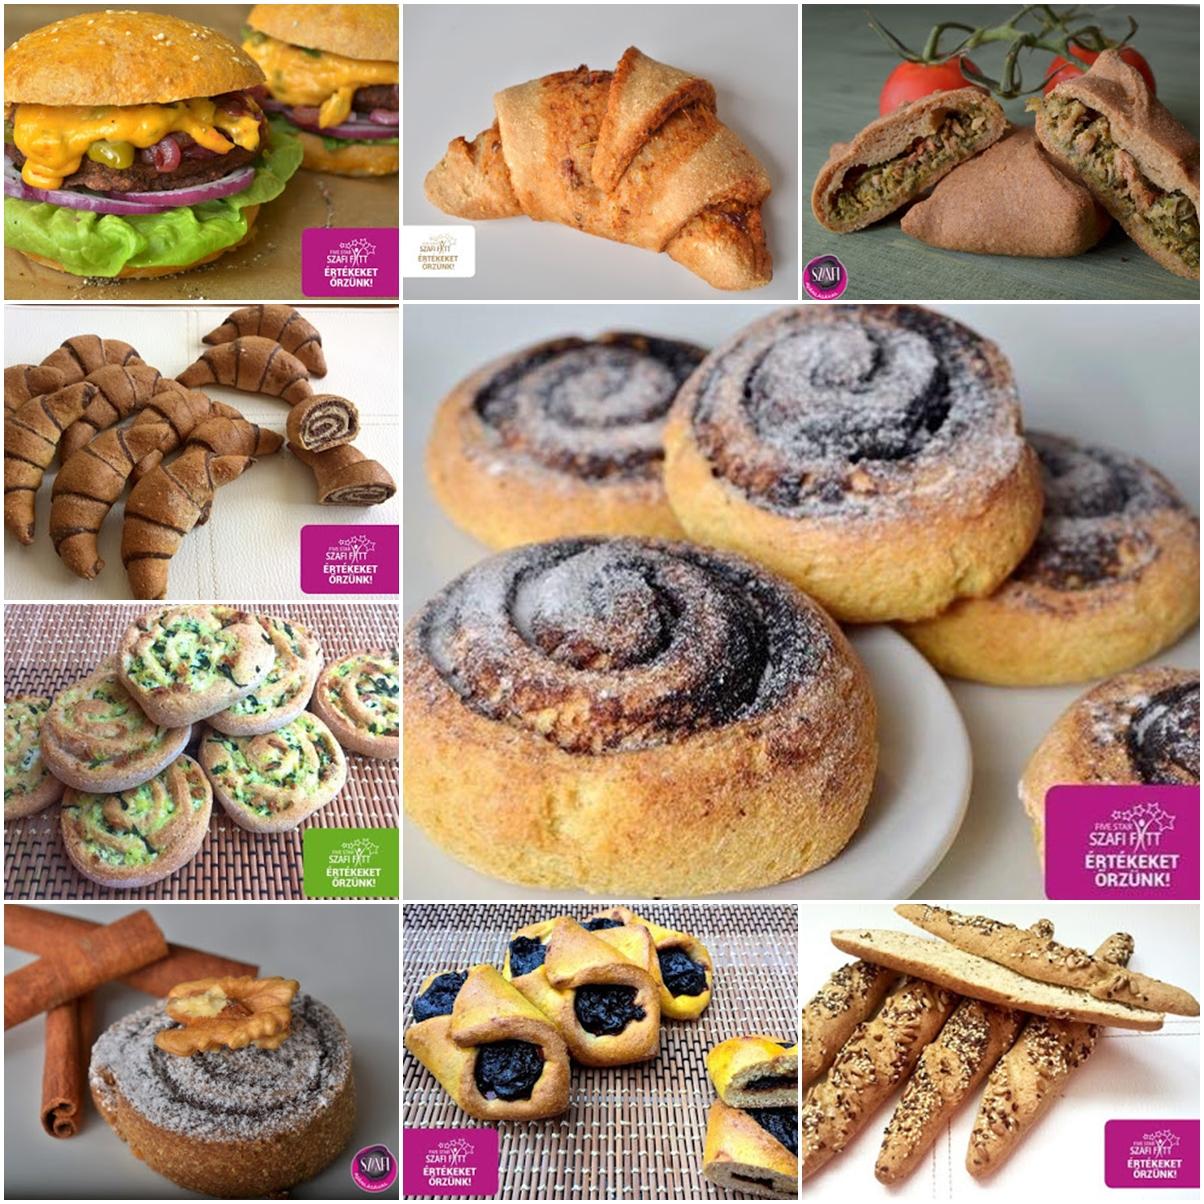 Top 10 PALEO péksüti